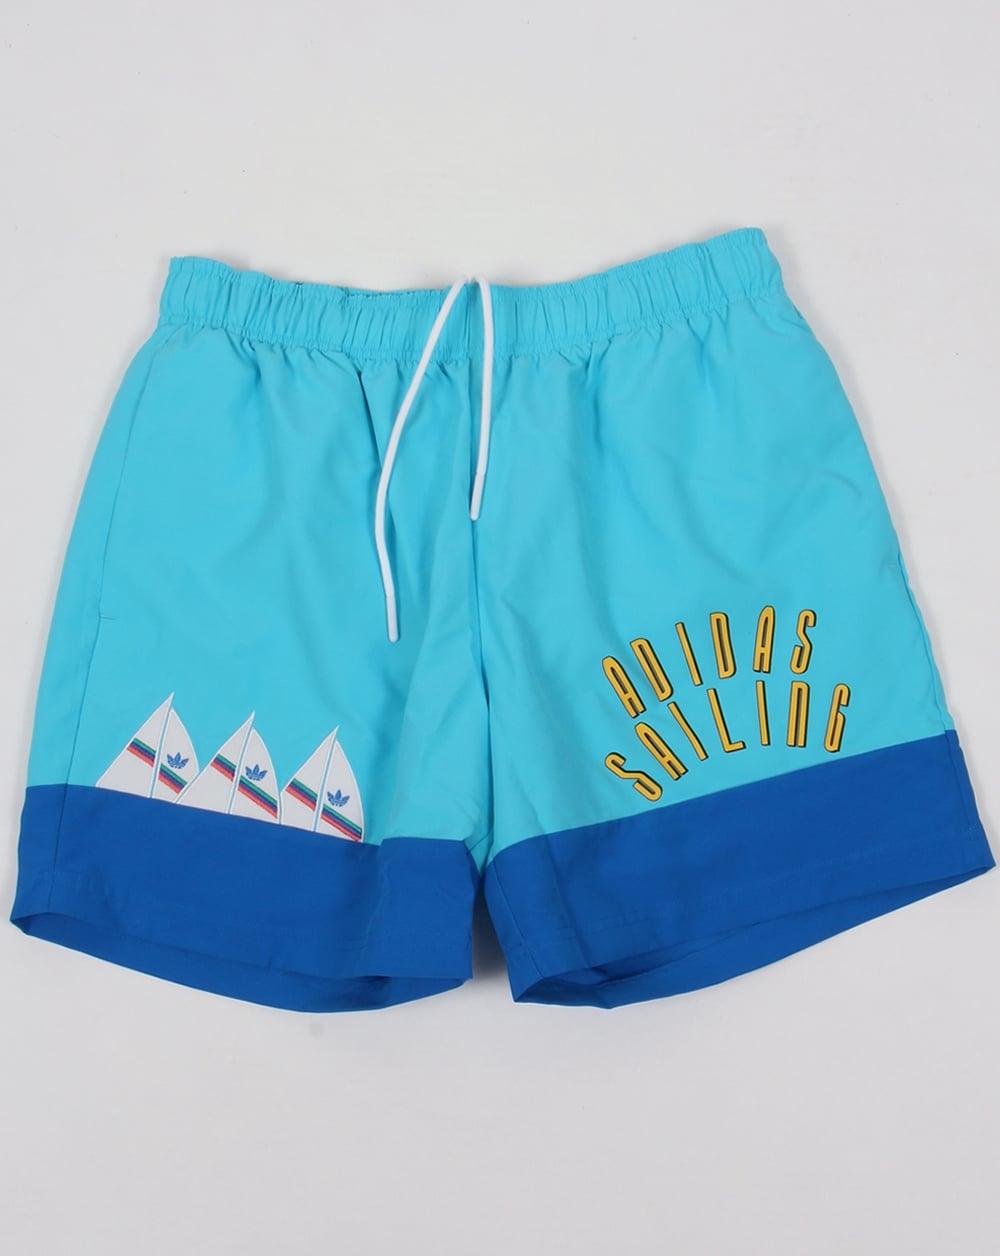 Adidas Originals Sailing Shorts Blue Swim Beach Mens Swimmers